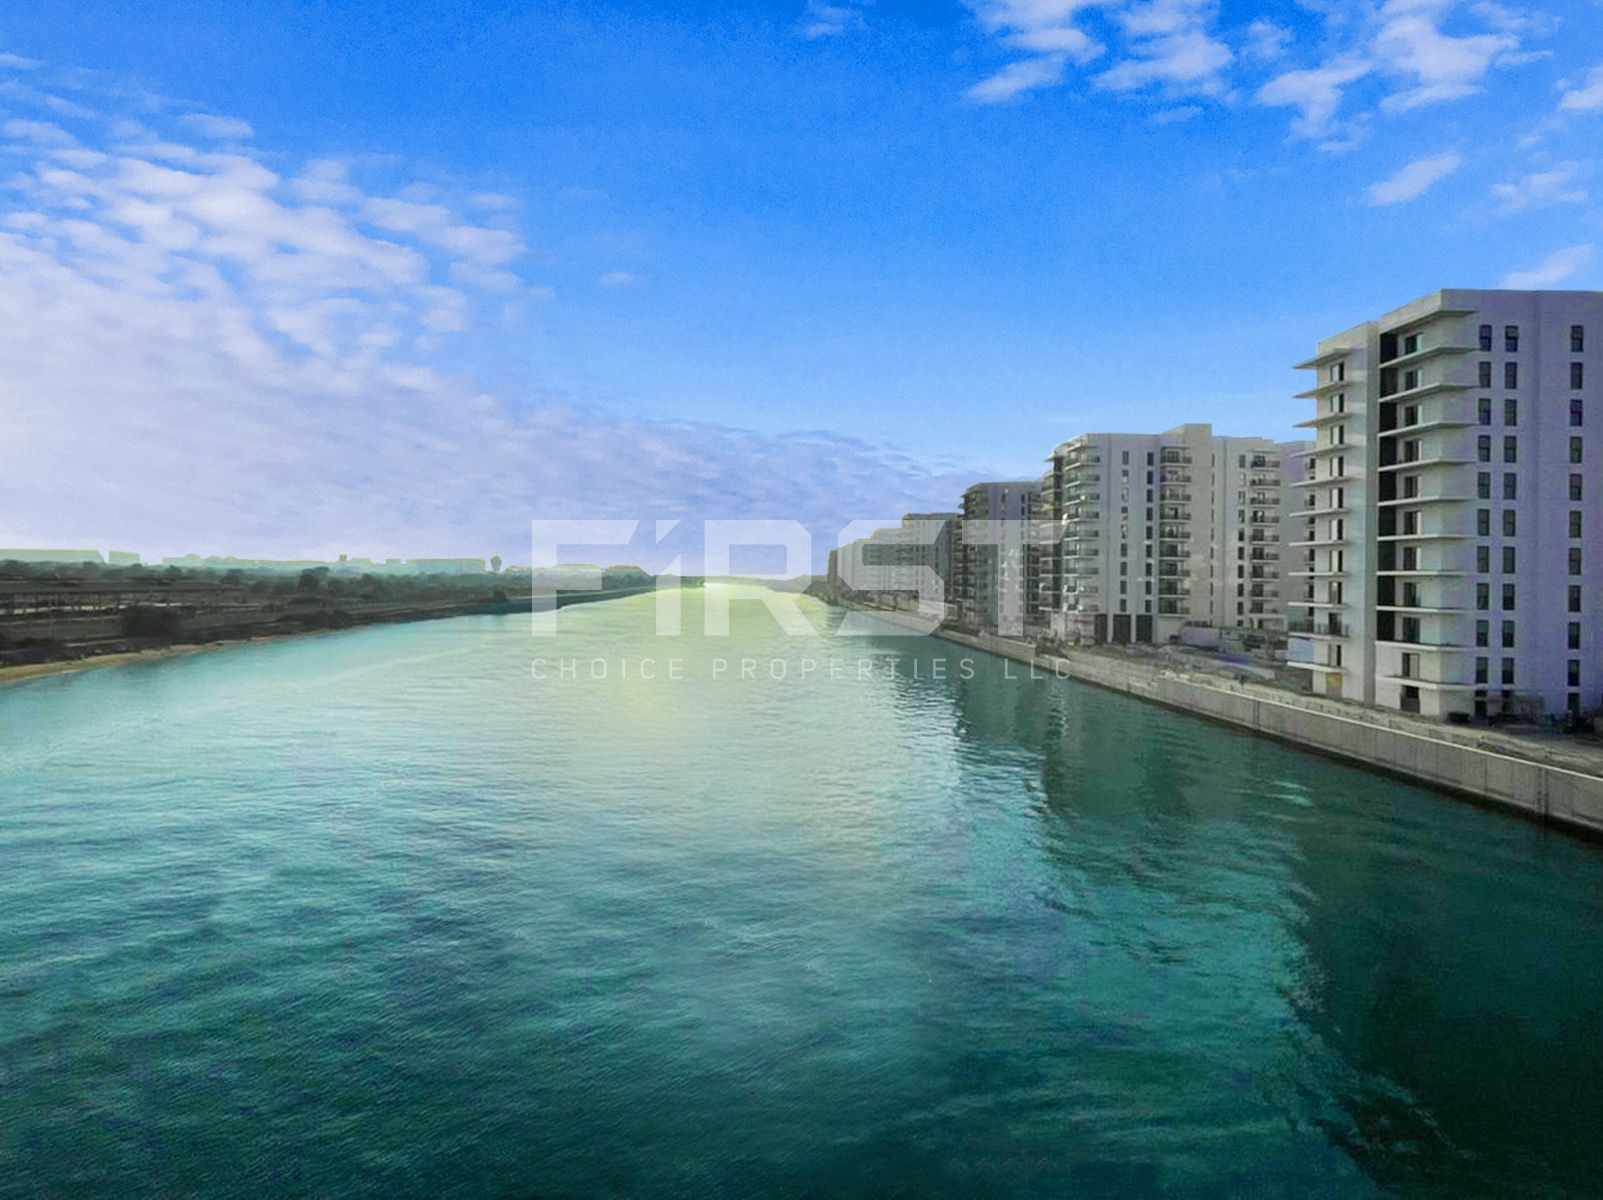 External Photos of Waters Edge Yas Island Abu Dhabi UAE (2).jpg